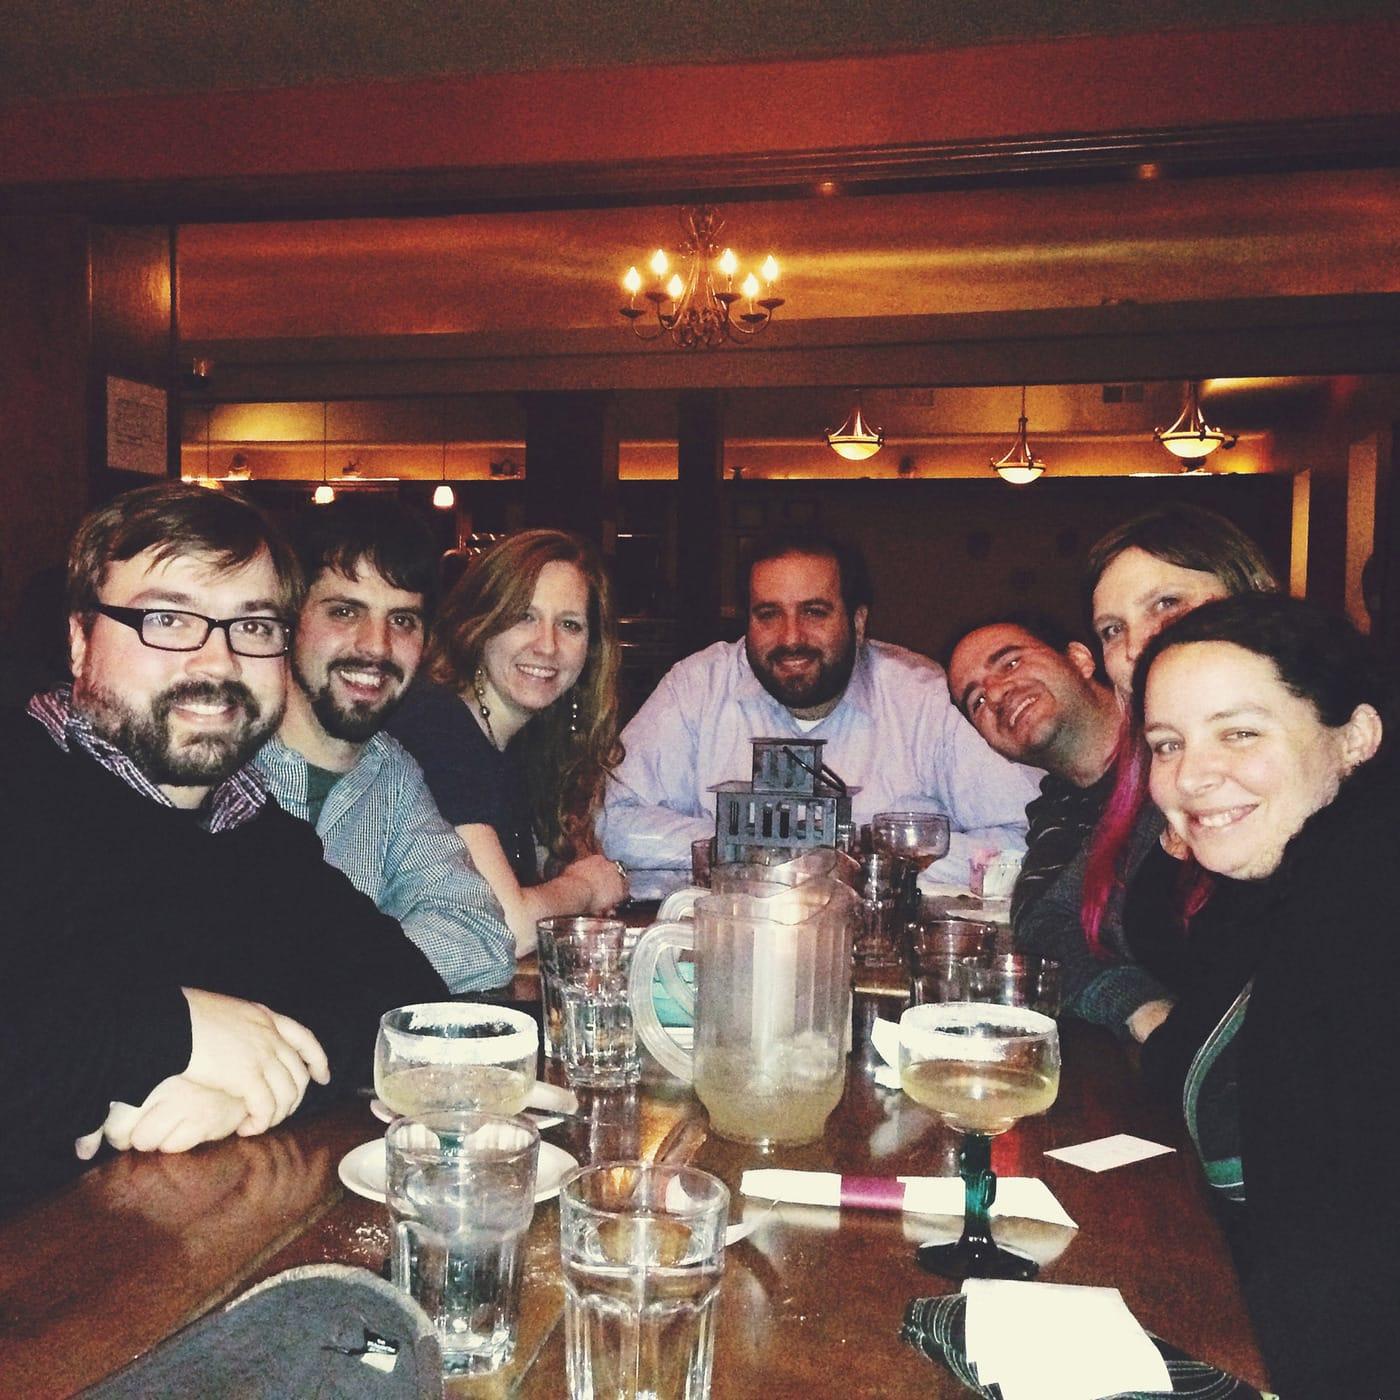 Birthday Dinner at Las Tablas, a Colombian restaurant in Chicago